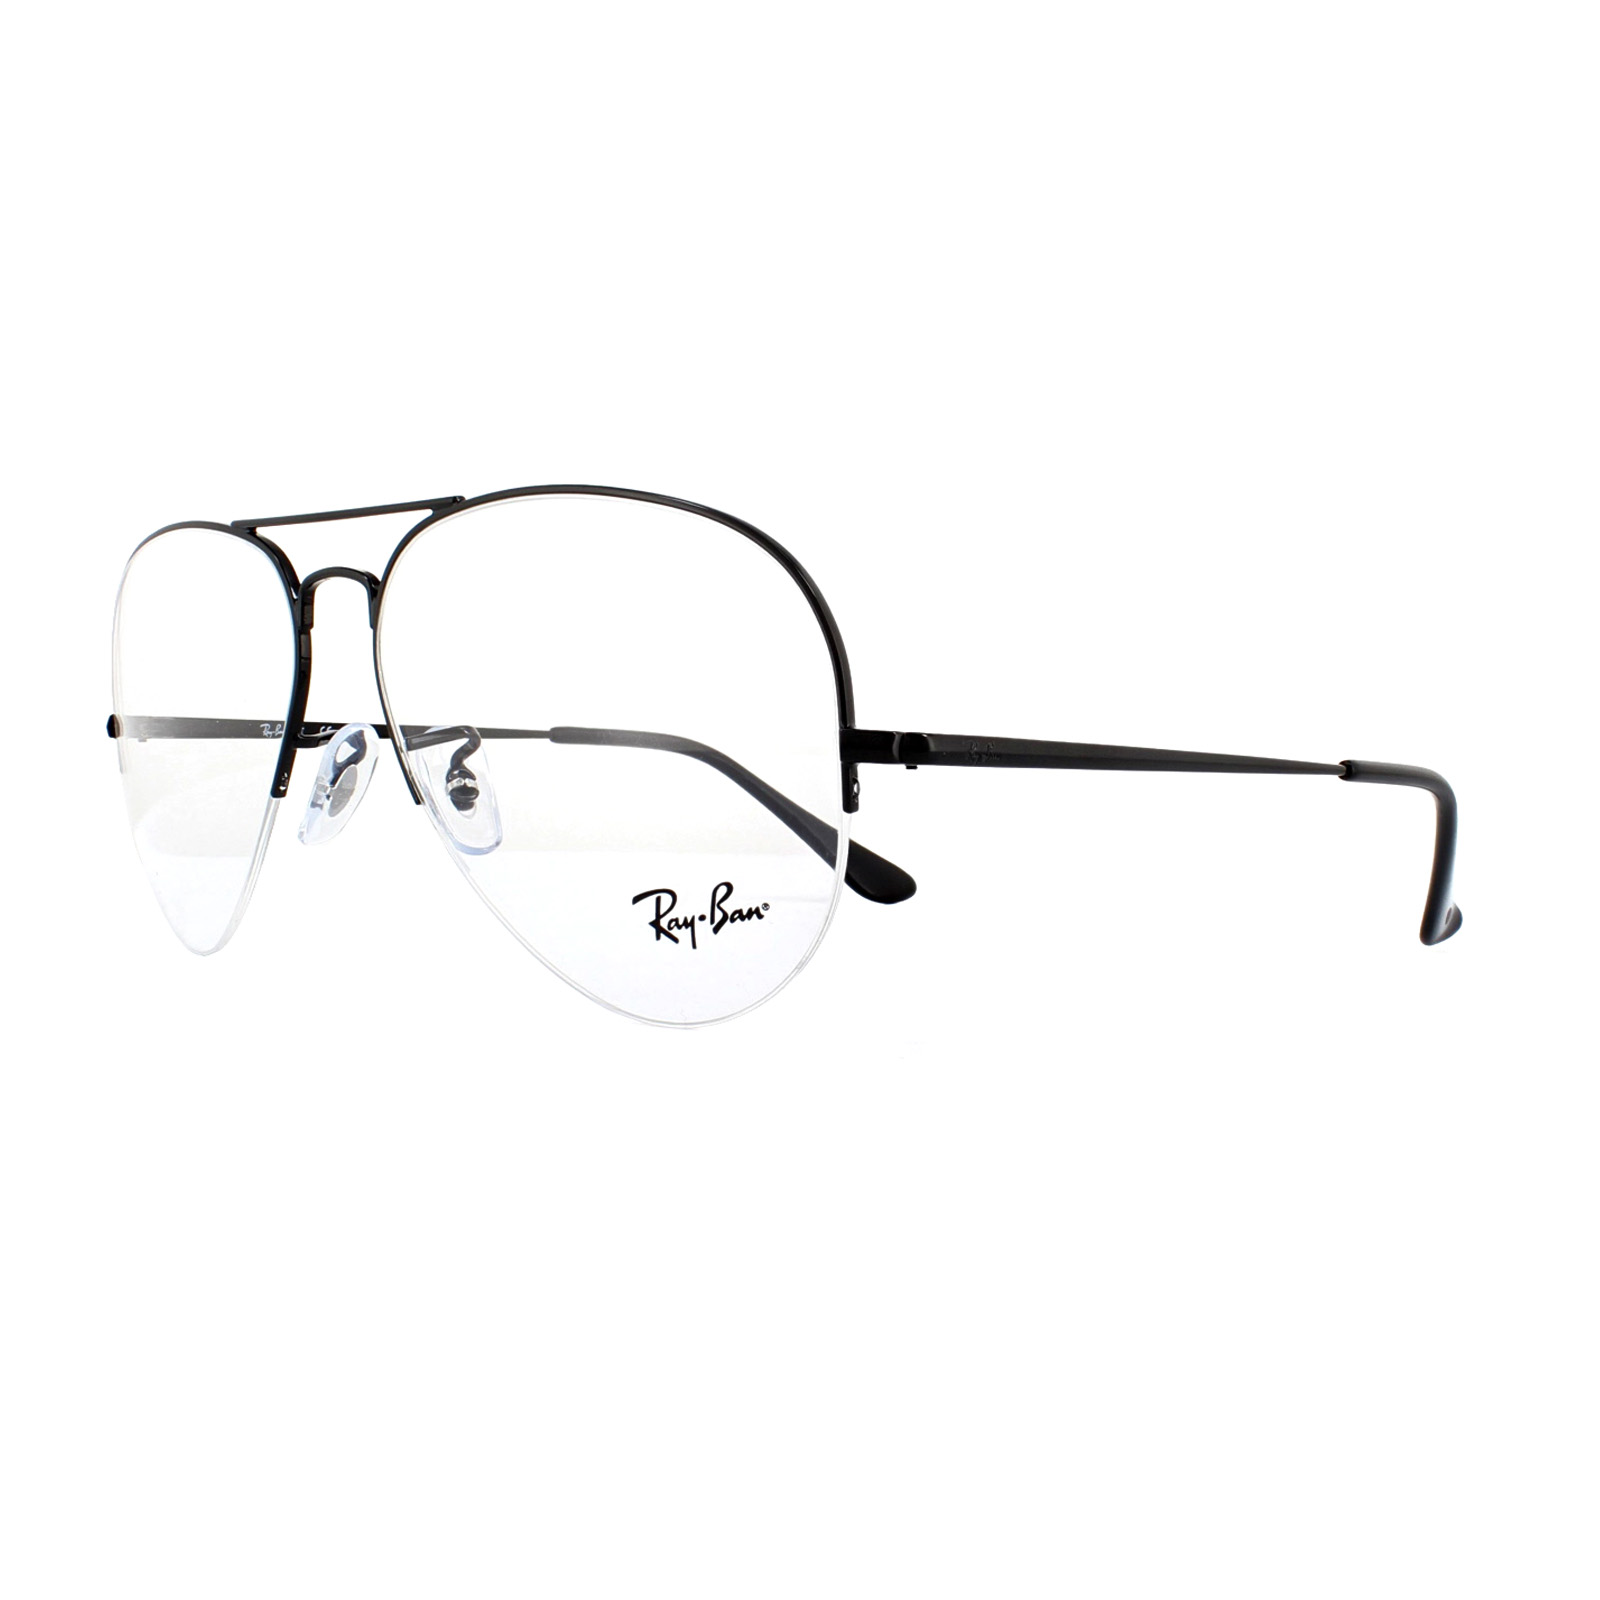 6d773f7126 Ray-Ban Glasses Frames 6589 2509 Black 59mm 8053672864151